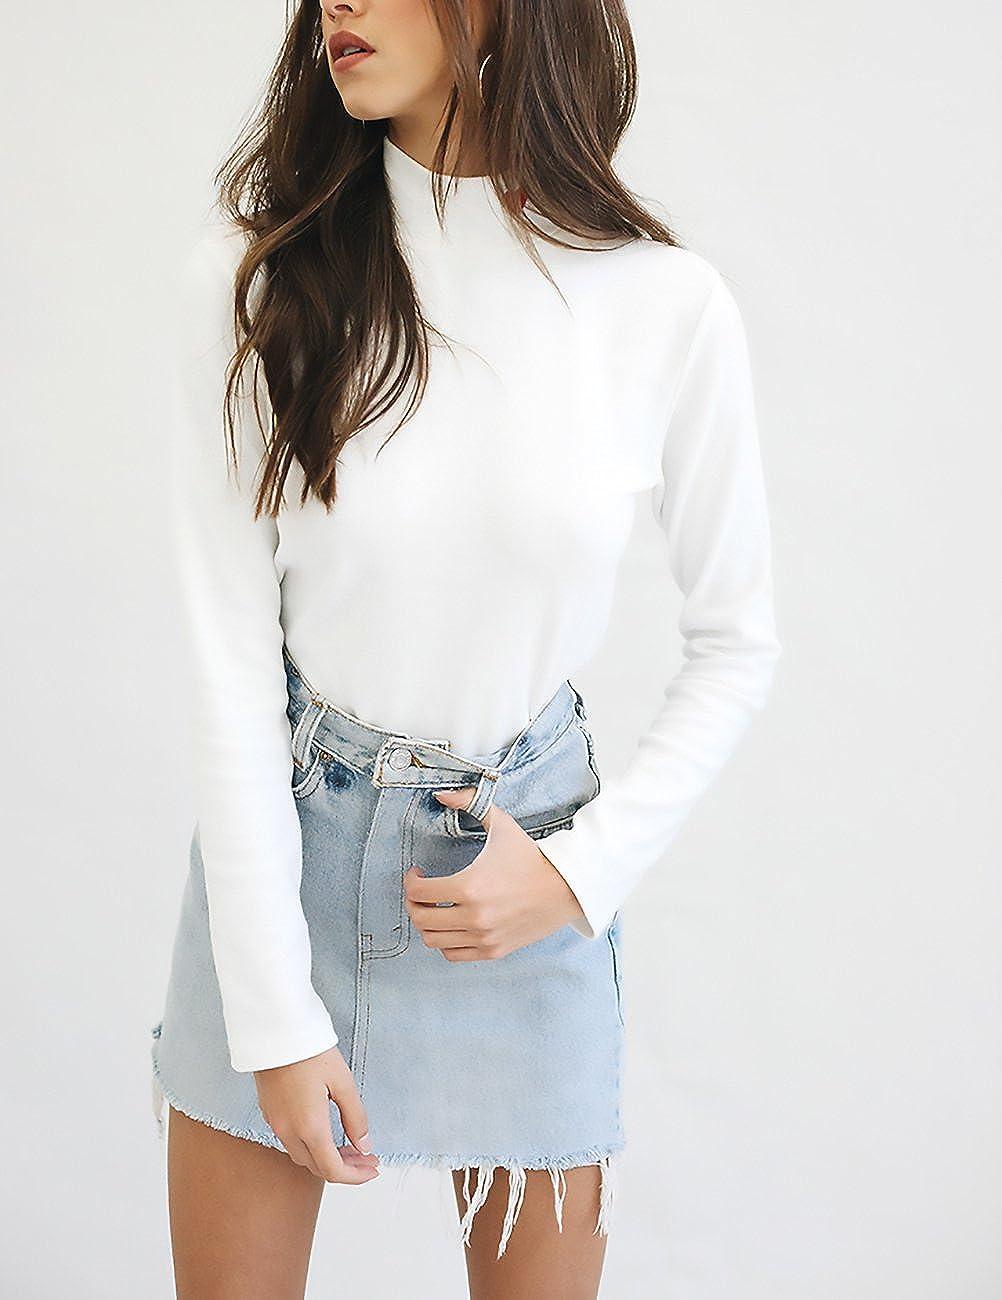 Mujer Camisetas Blancas Manga Larga Camisas Basicas Elegantes Bordado Basic Ropa Cuello Alto Slim Fit T Shirt Tops Invierno Otoño Moda Casual Juveniles ...